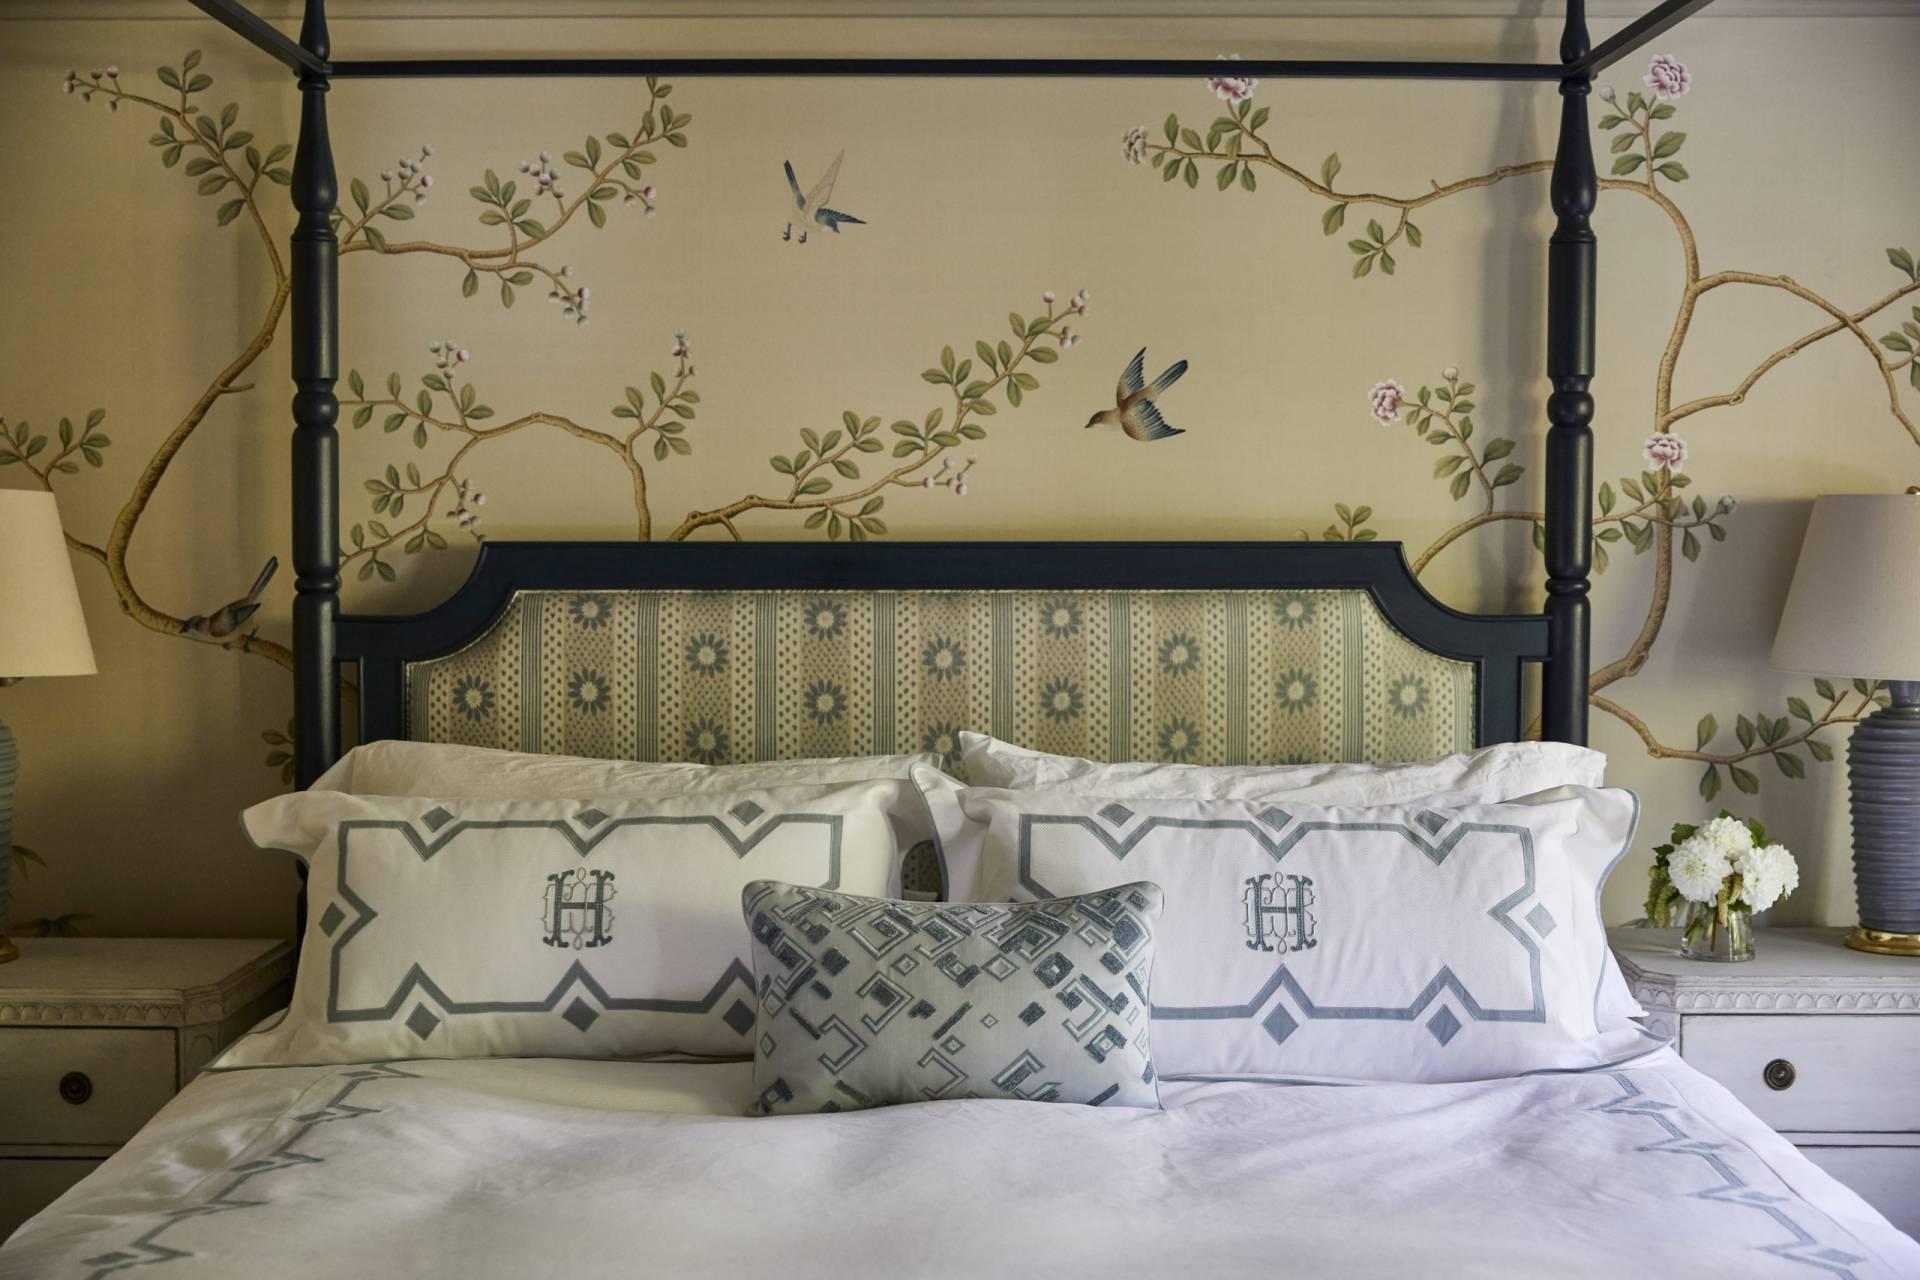 Upholstered headboard, custom bedding, and shams monographed